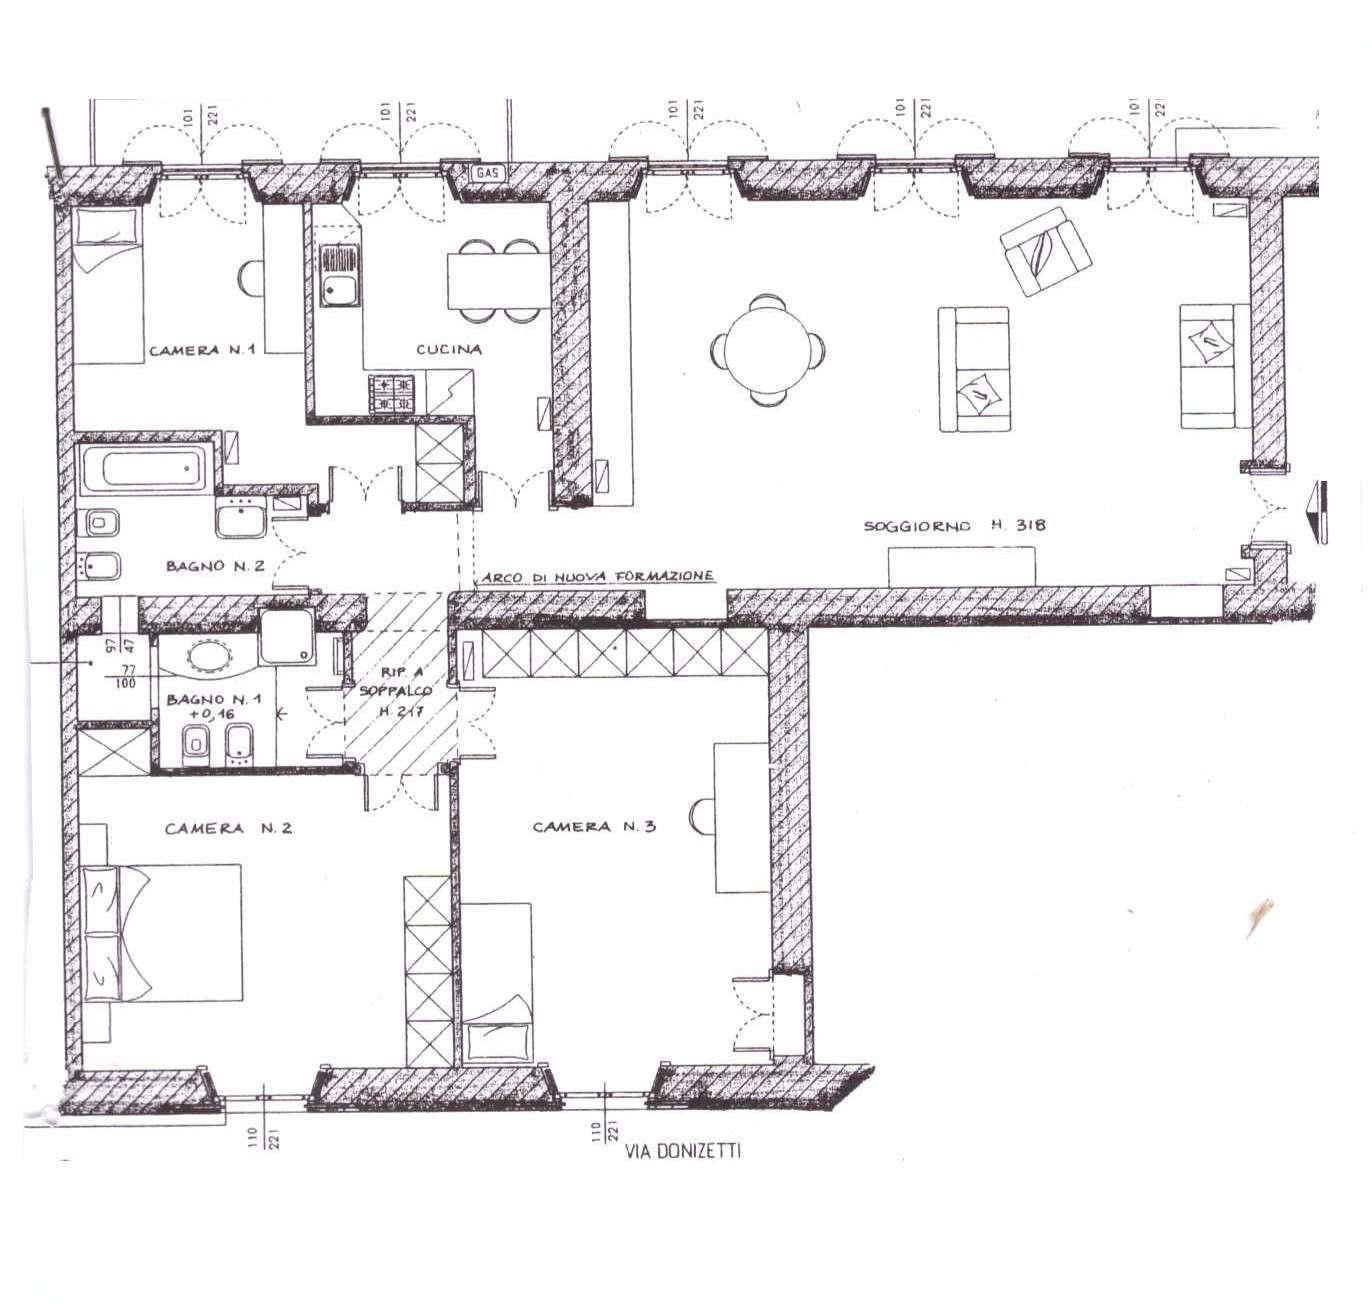 planimetria donizetti terzo piano